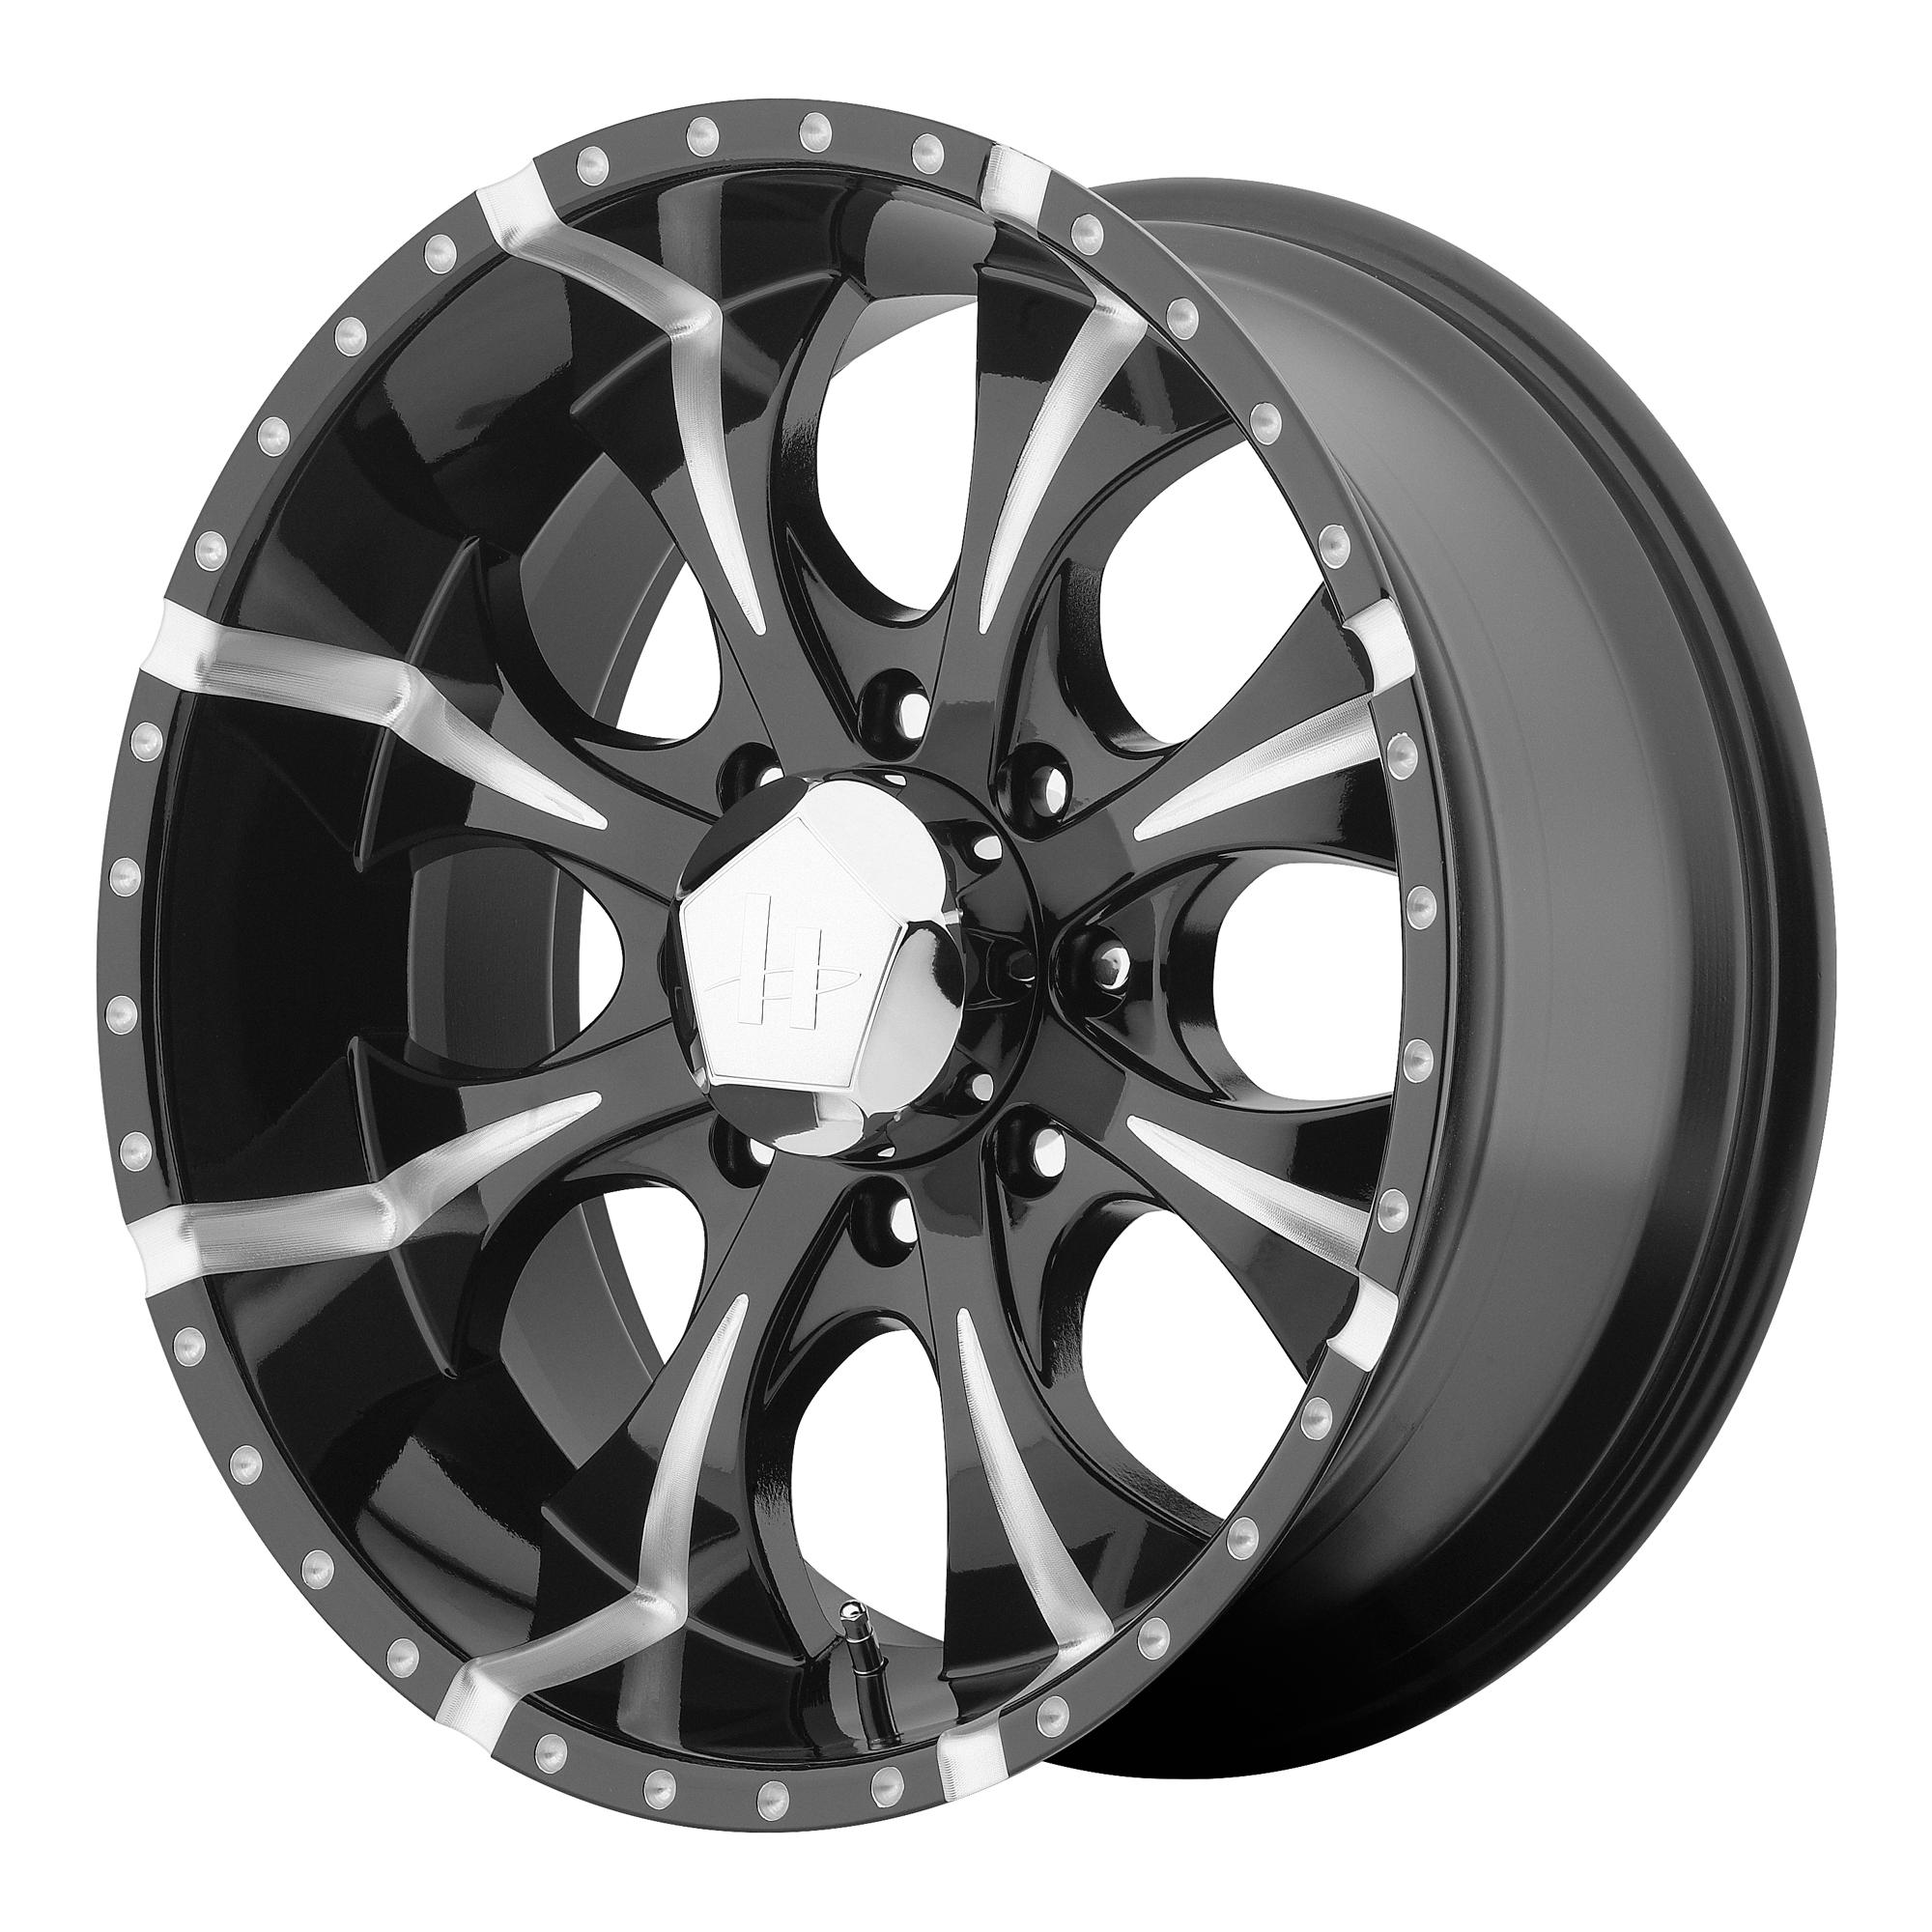 Helo Wheels MAXX Gloss Black Milled